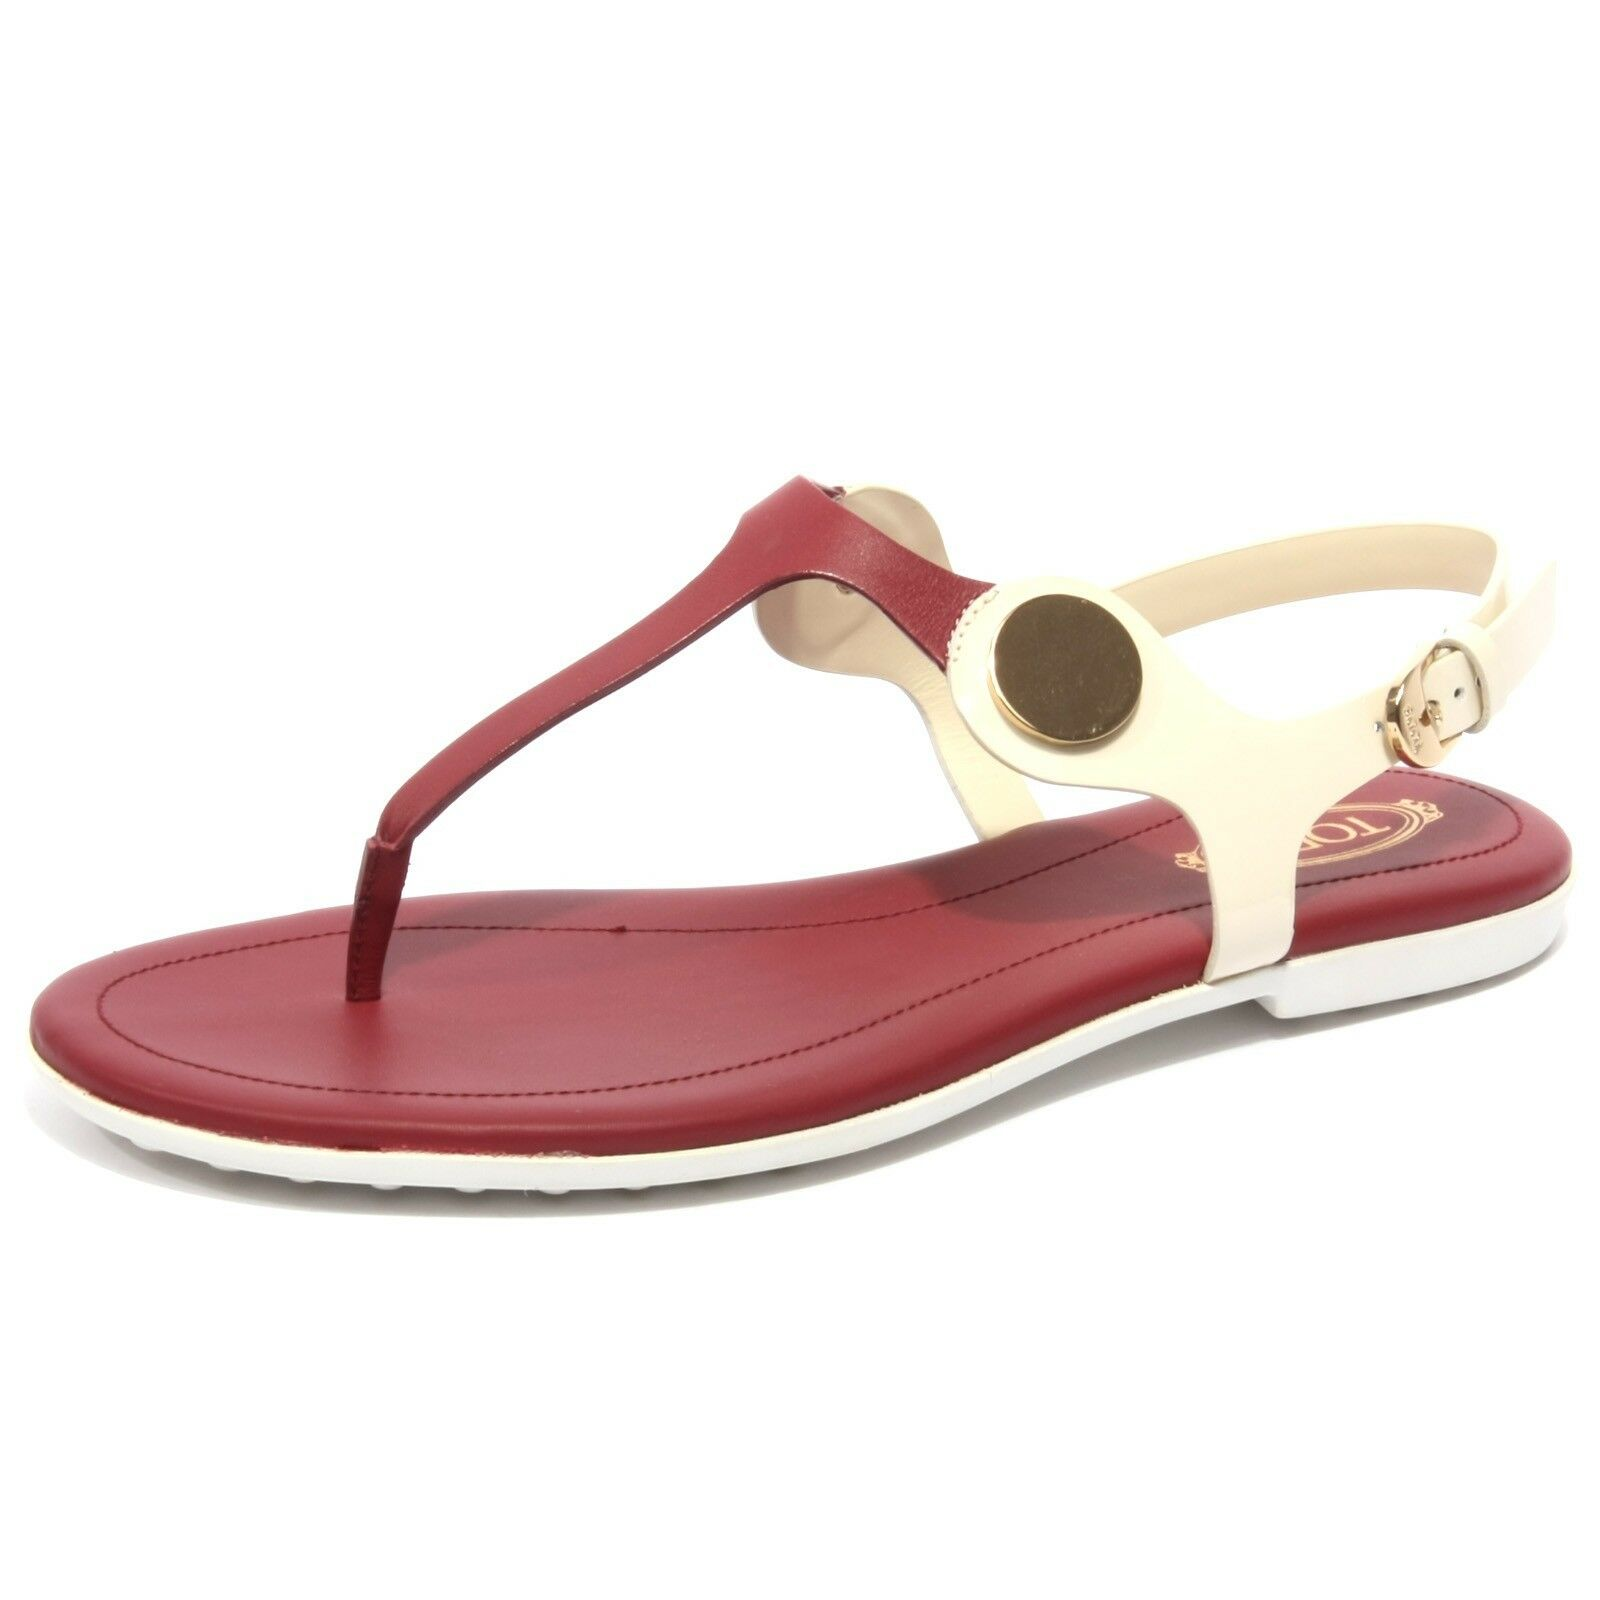 B1672 infradito mujer Tod's sandalo Panna amaranto flip flops zapatos Woman